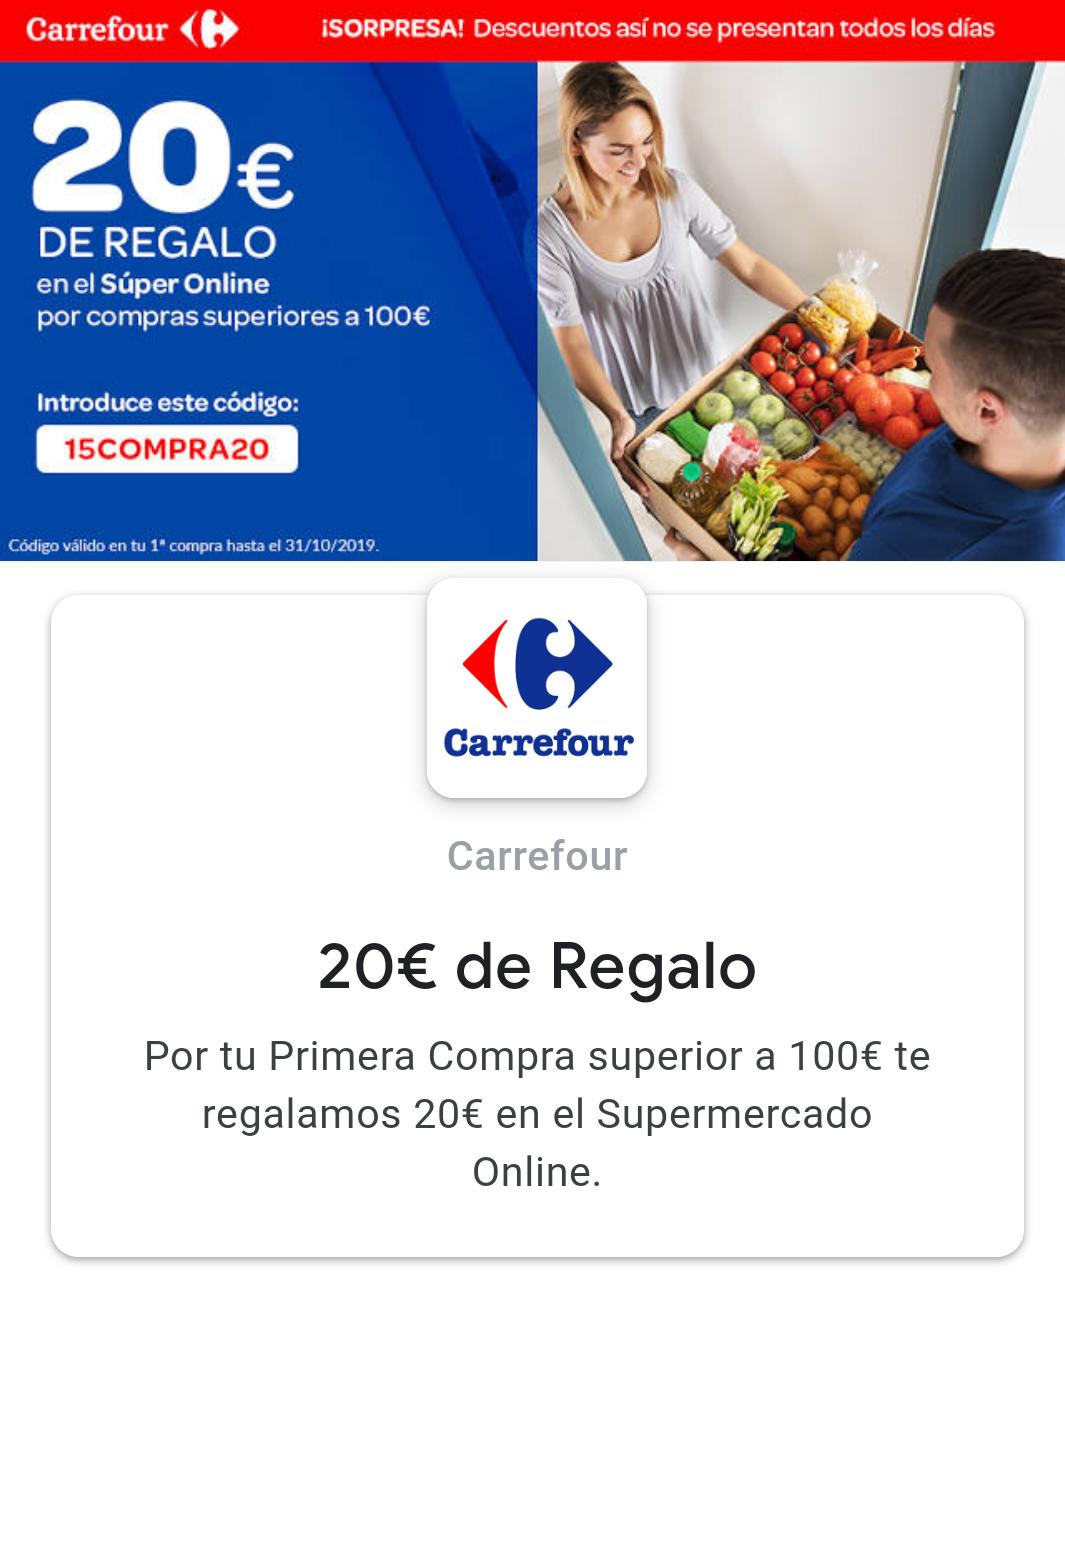 Descuento 20€ en Carrefour Online - Mínimo de 100€